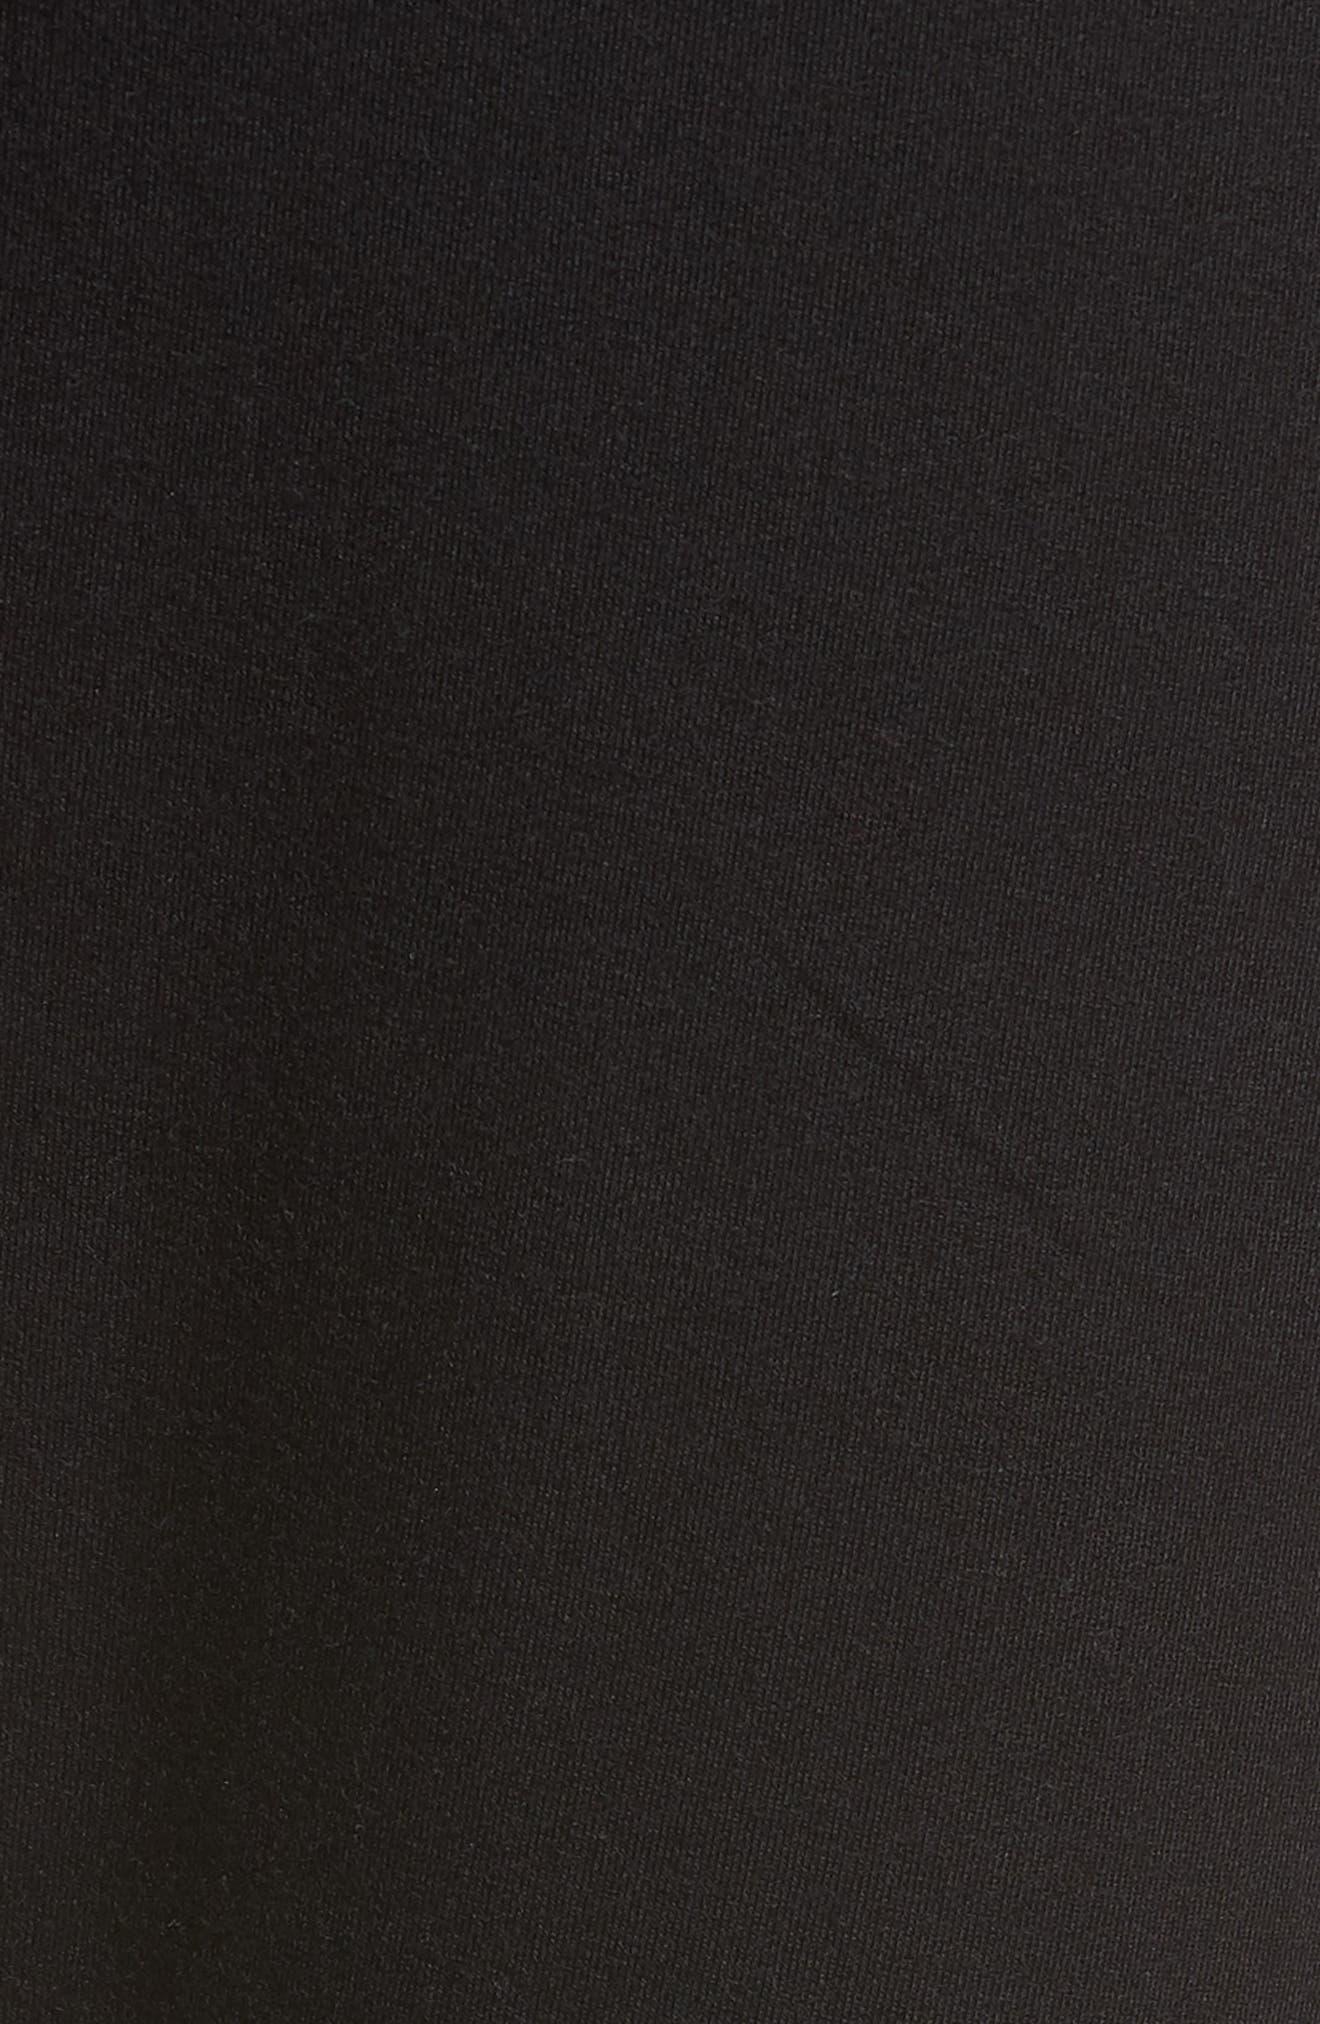 Jogger Pants,                             Alternate thumbnail 5, color,                             POLO BLACK